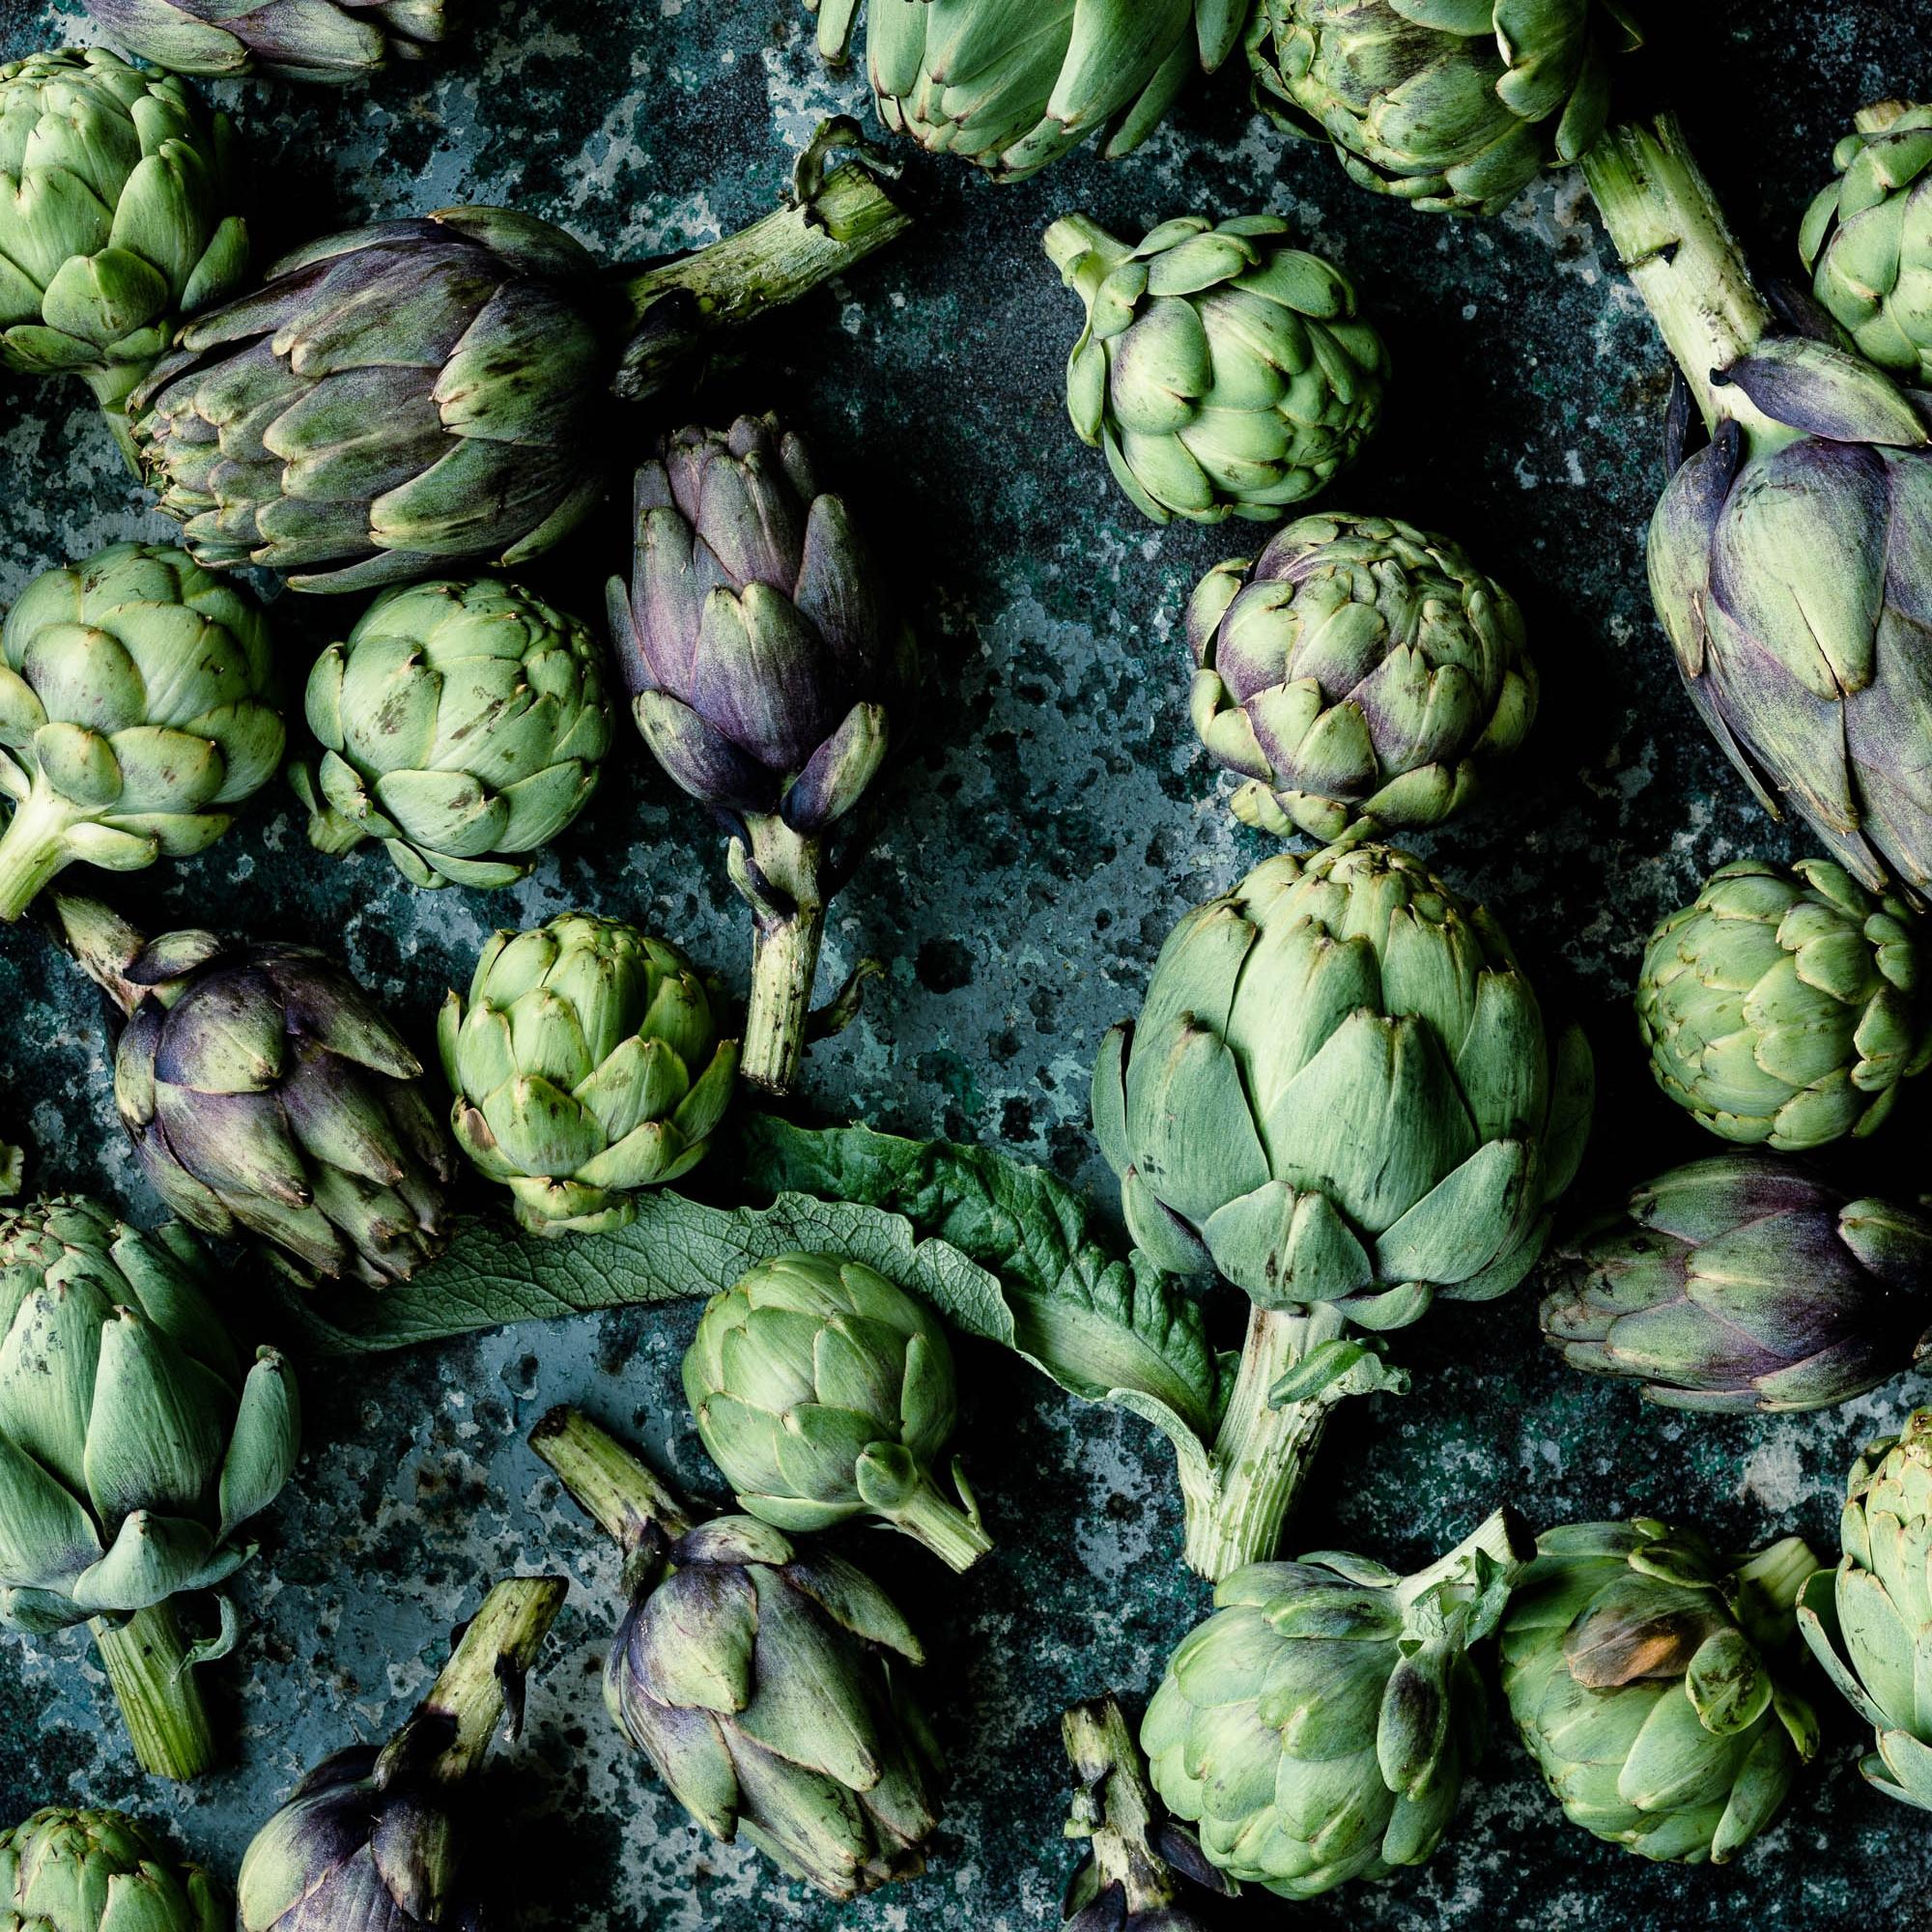 Artischocken - veggielicious | gemüse. fotos. rezepte.